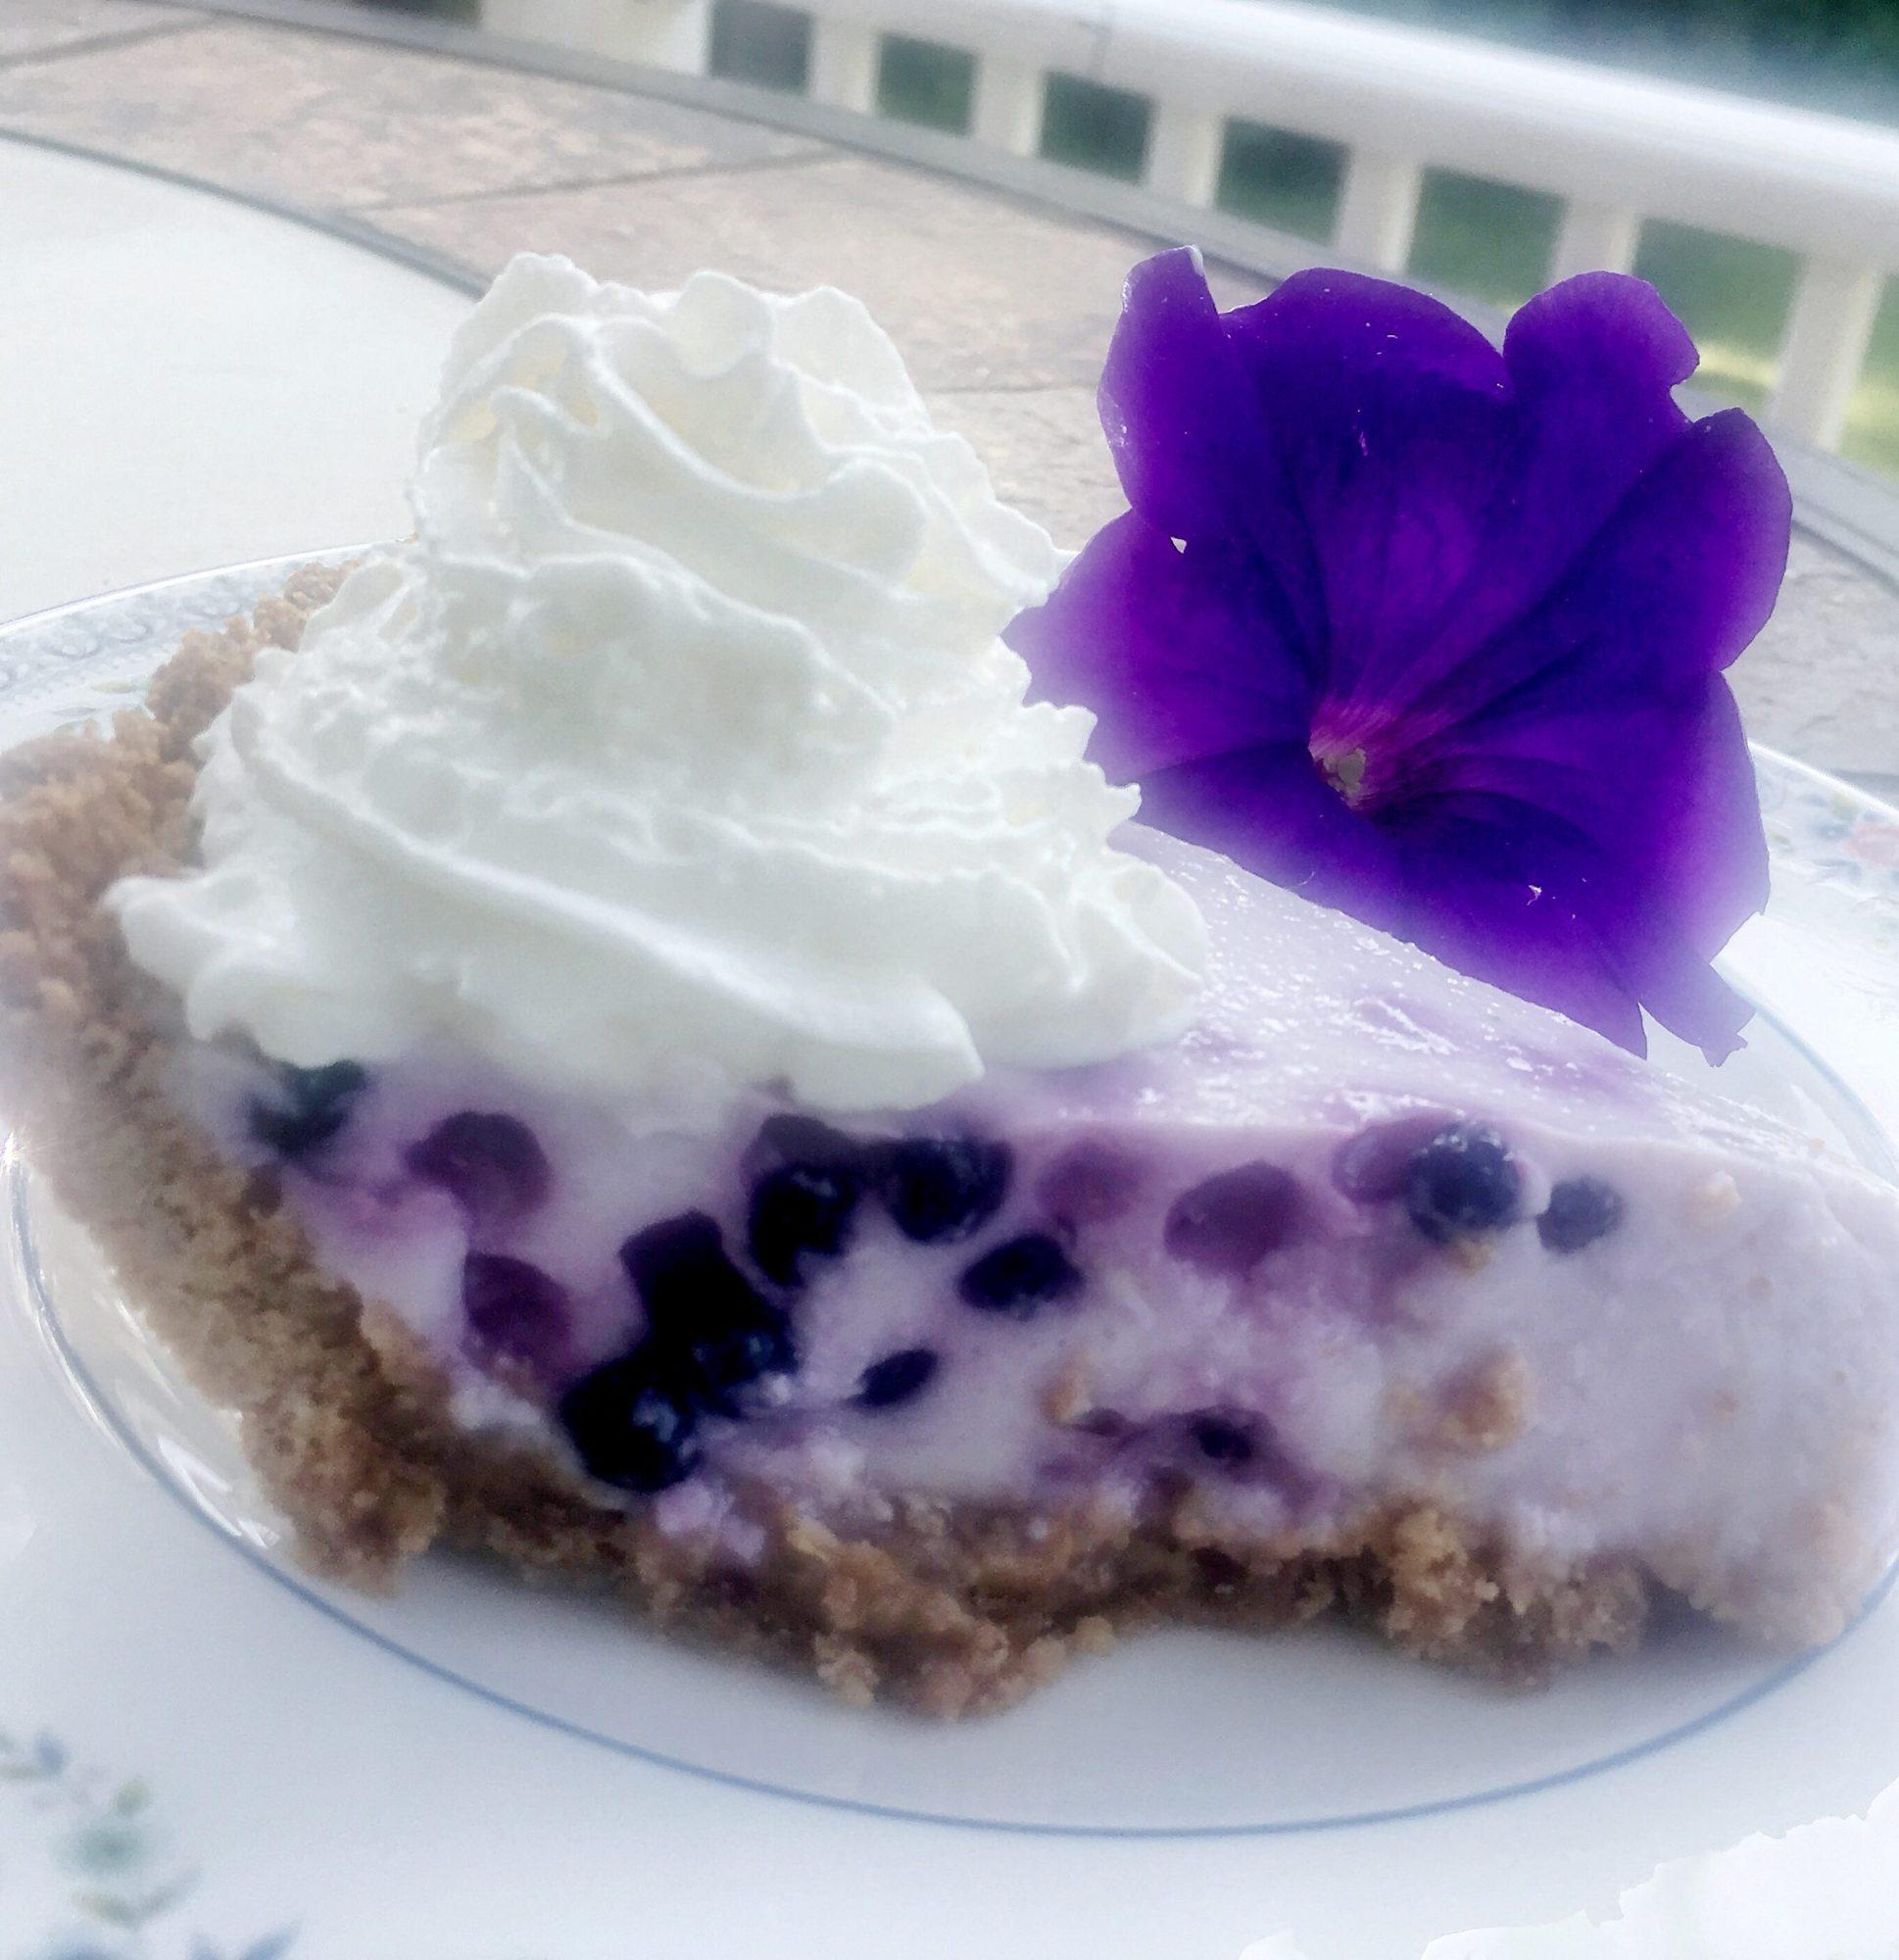 blueberry yogurt pie with purple petunia